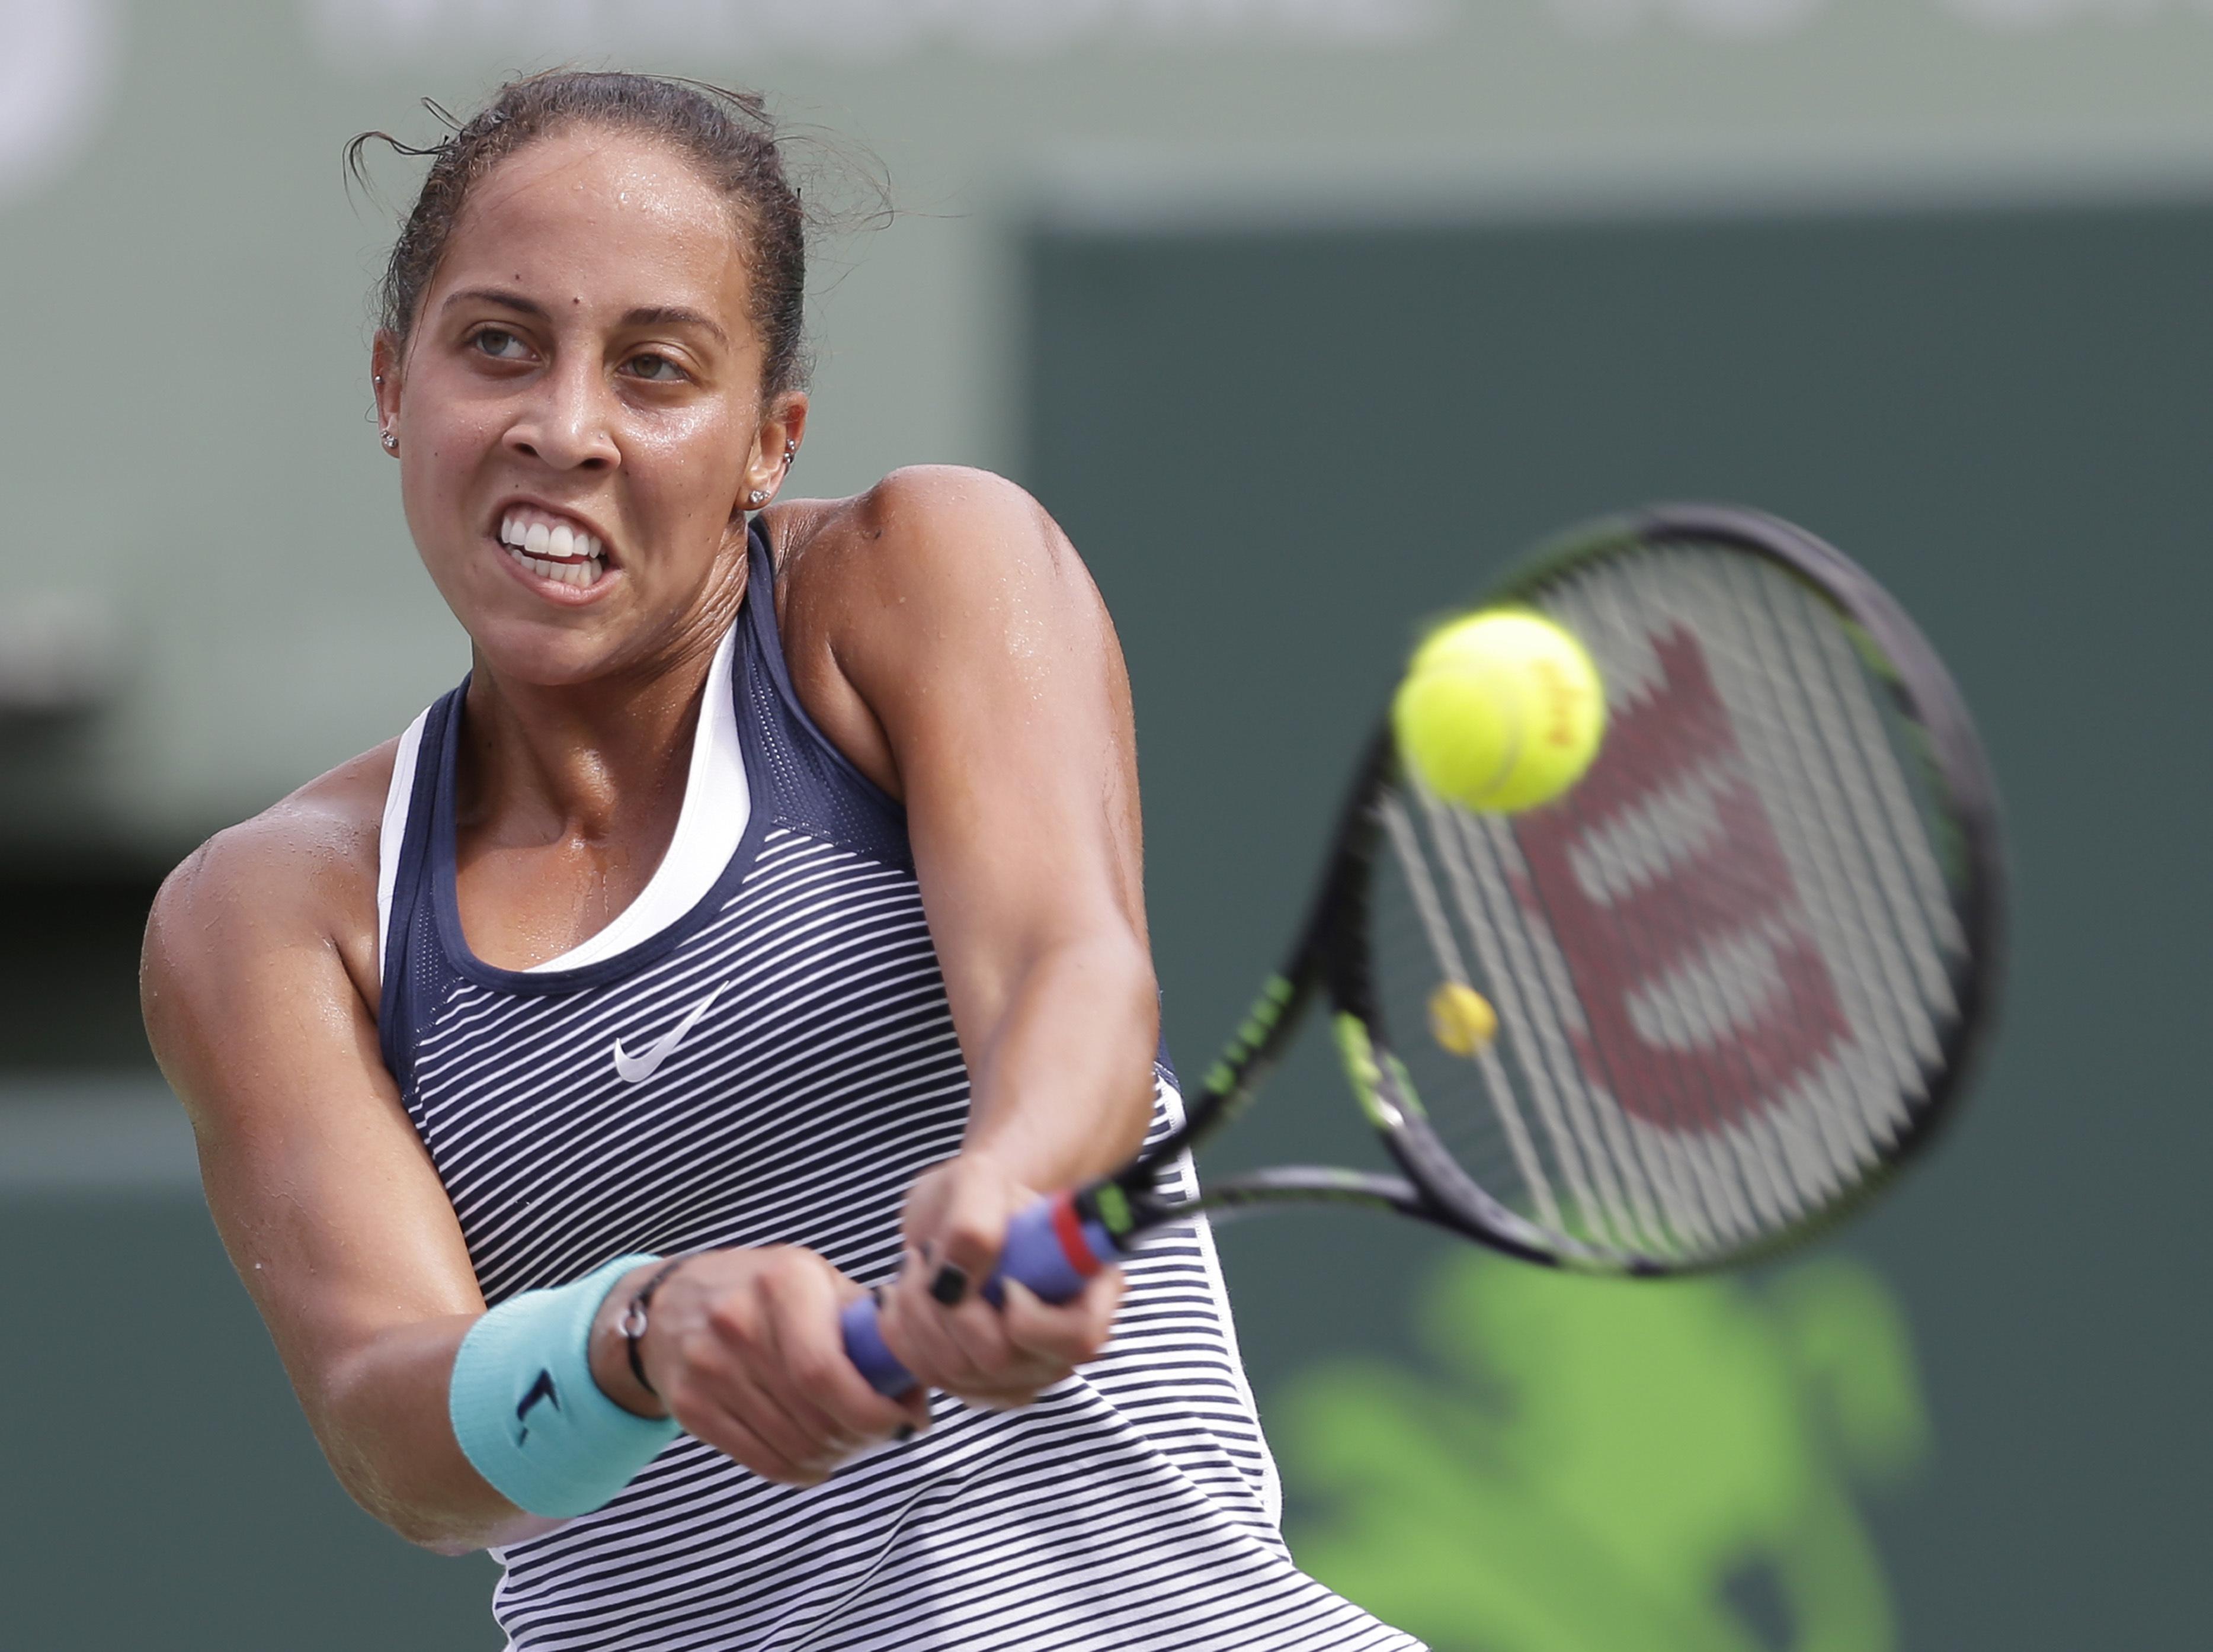 Madison Keys returns to Roberta Vinci, of Italy, during the Miami Open tennis tournament in Key Biscayne, Fla., Sunday, March 27, 2016. (AP Photo/Alan Diaz)